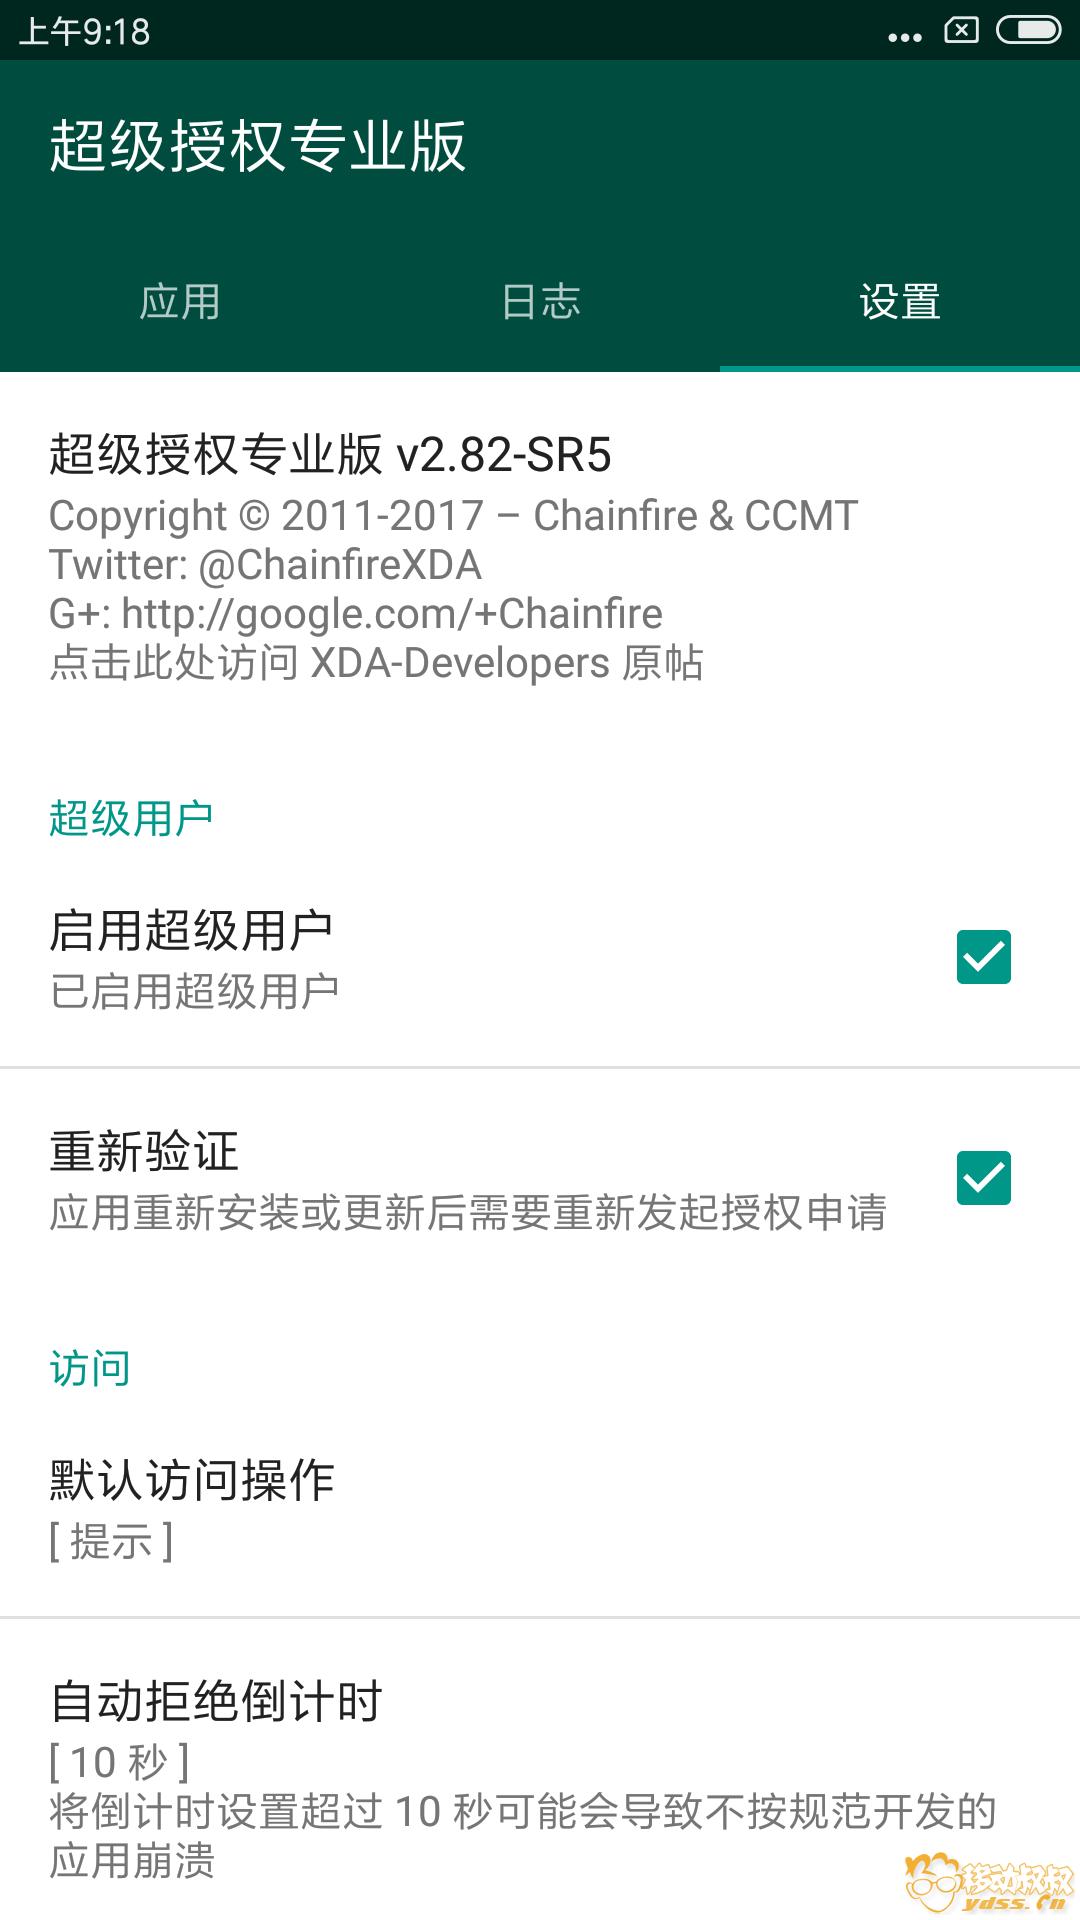 Screenshot_2018-07-06-09-18-57-274_eu.chainfire.supersu.png